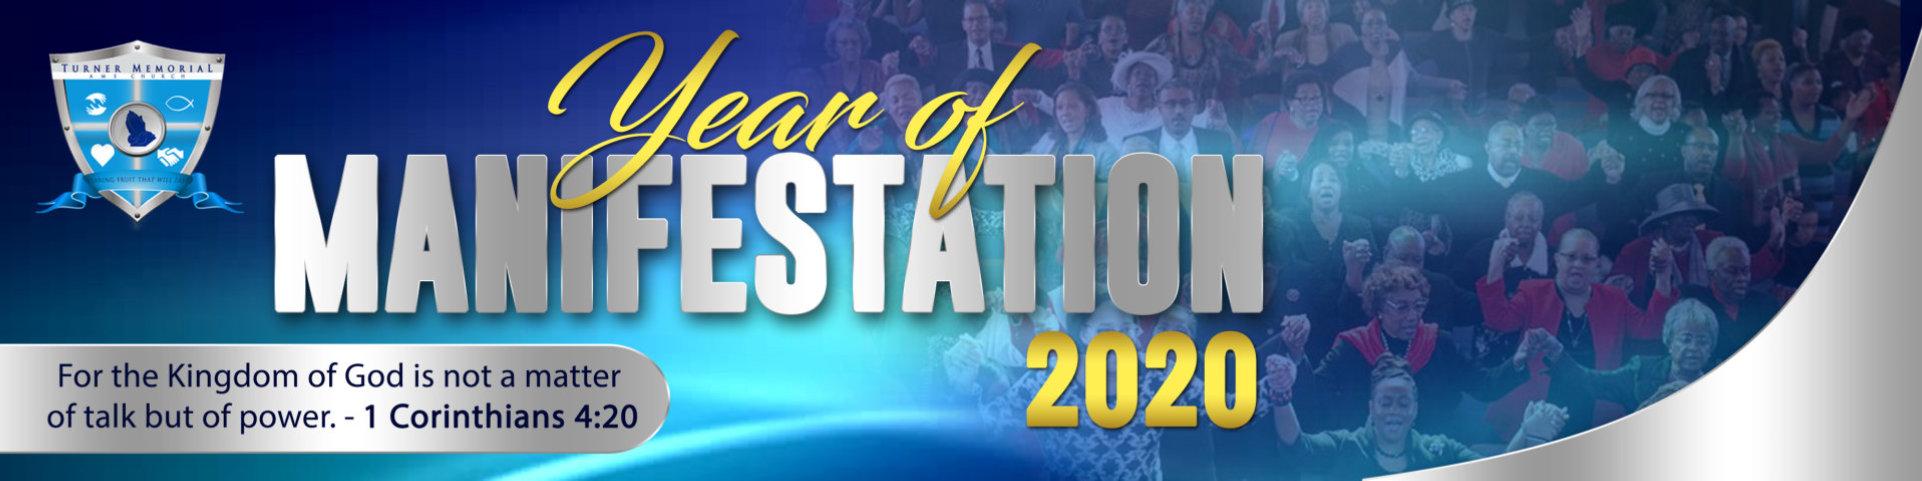 Year of Manifestation 2020 Banner